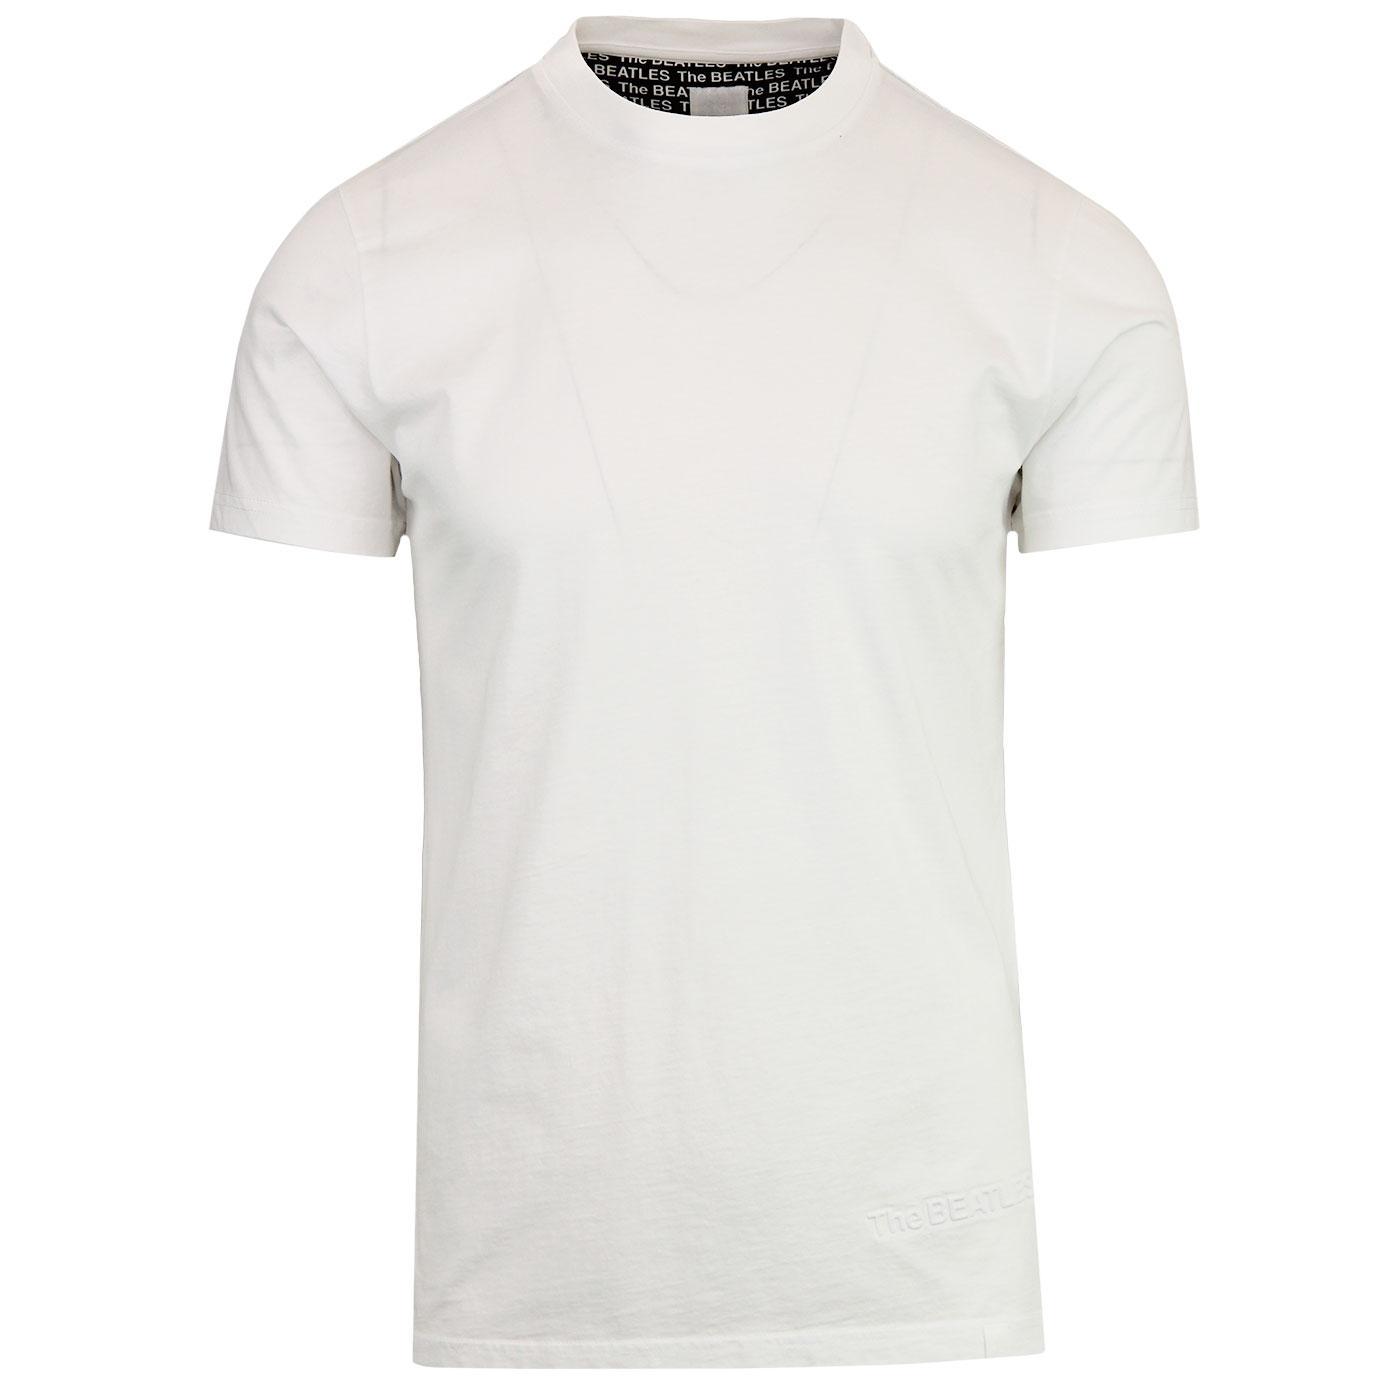 White Album PRETTY GREEN x THE BEATLES T-Shirt